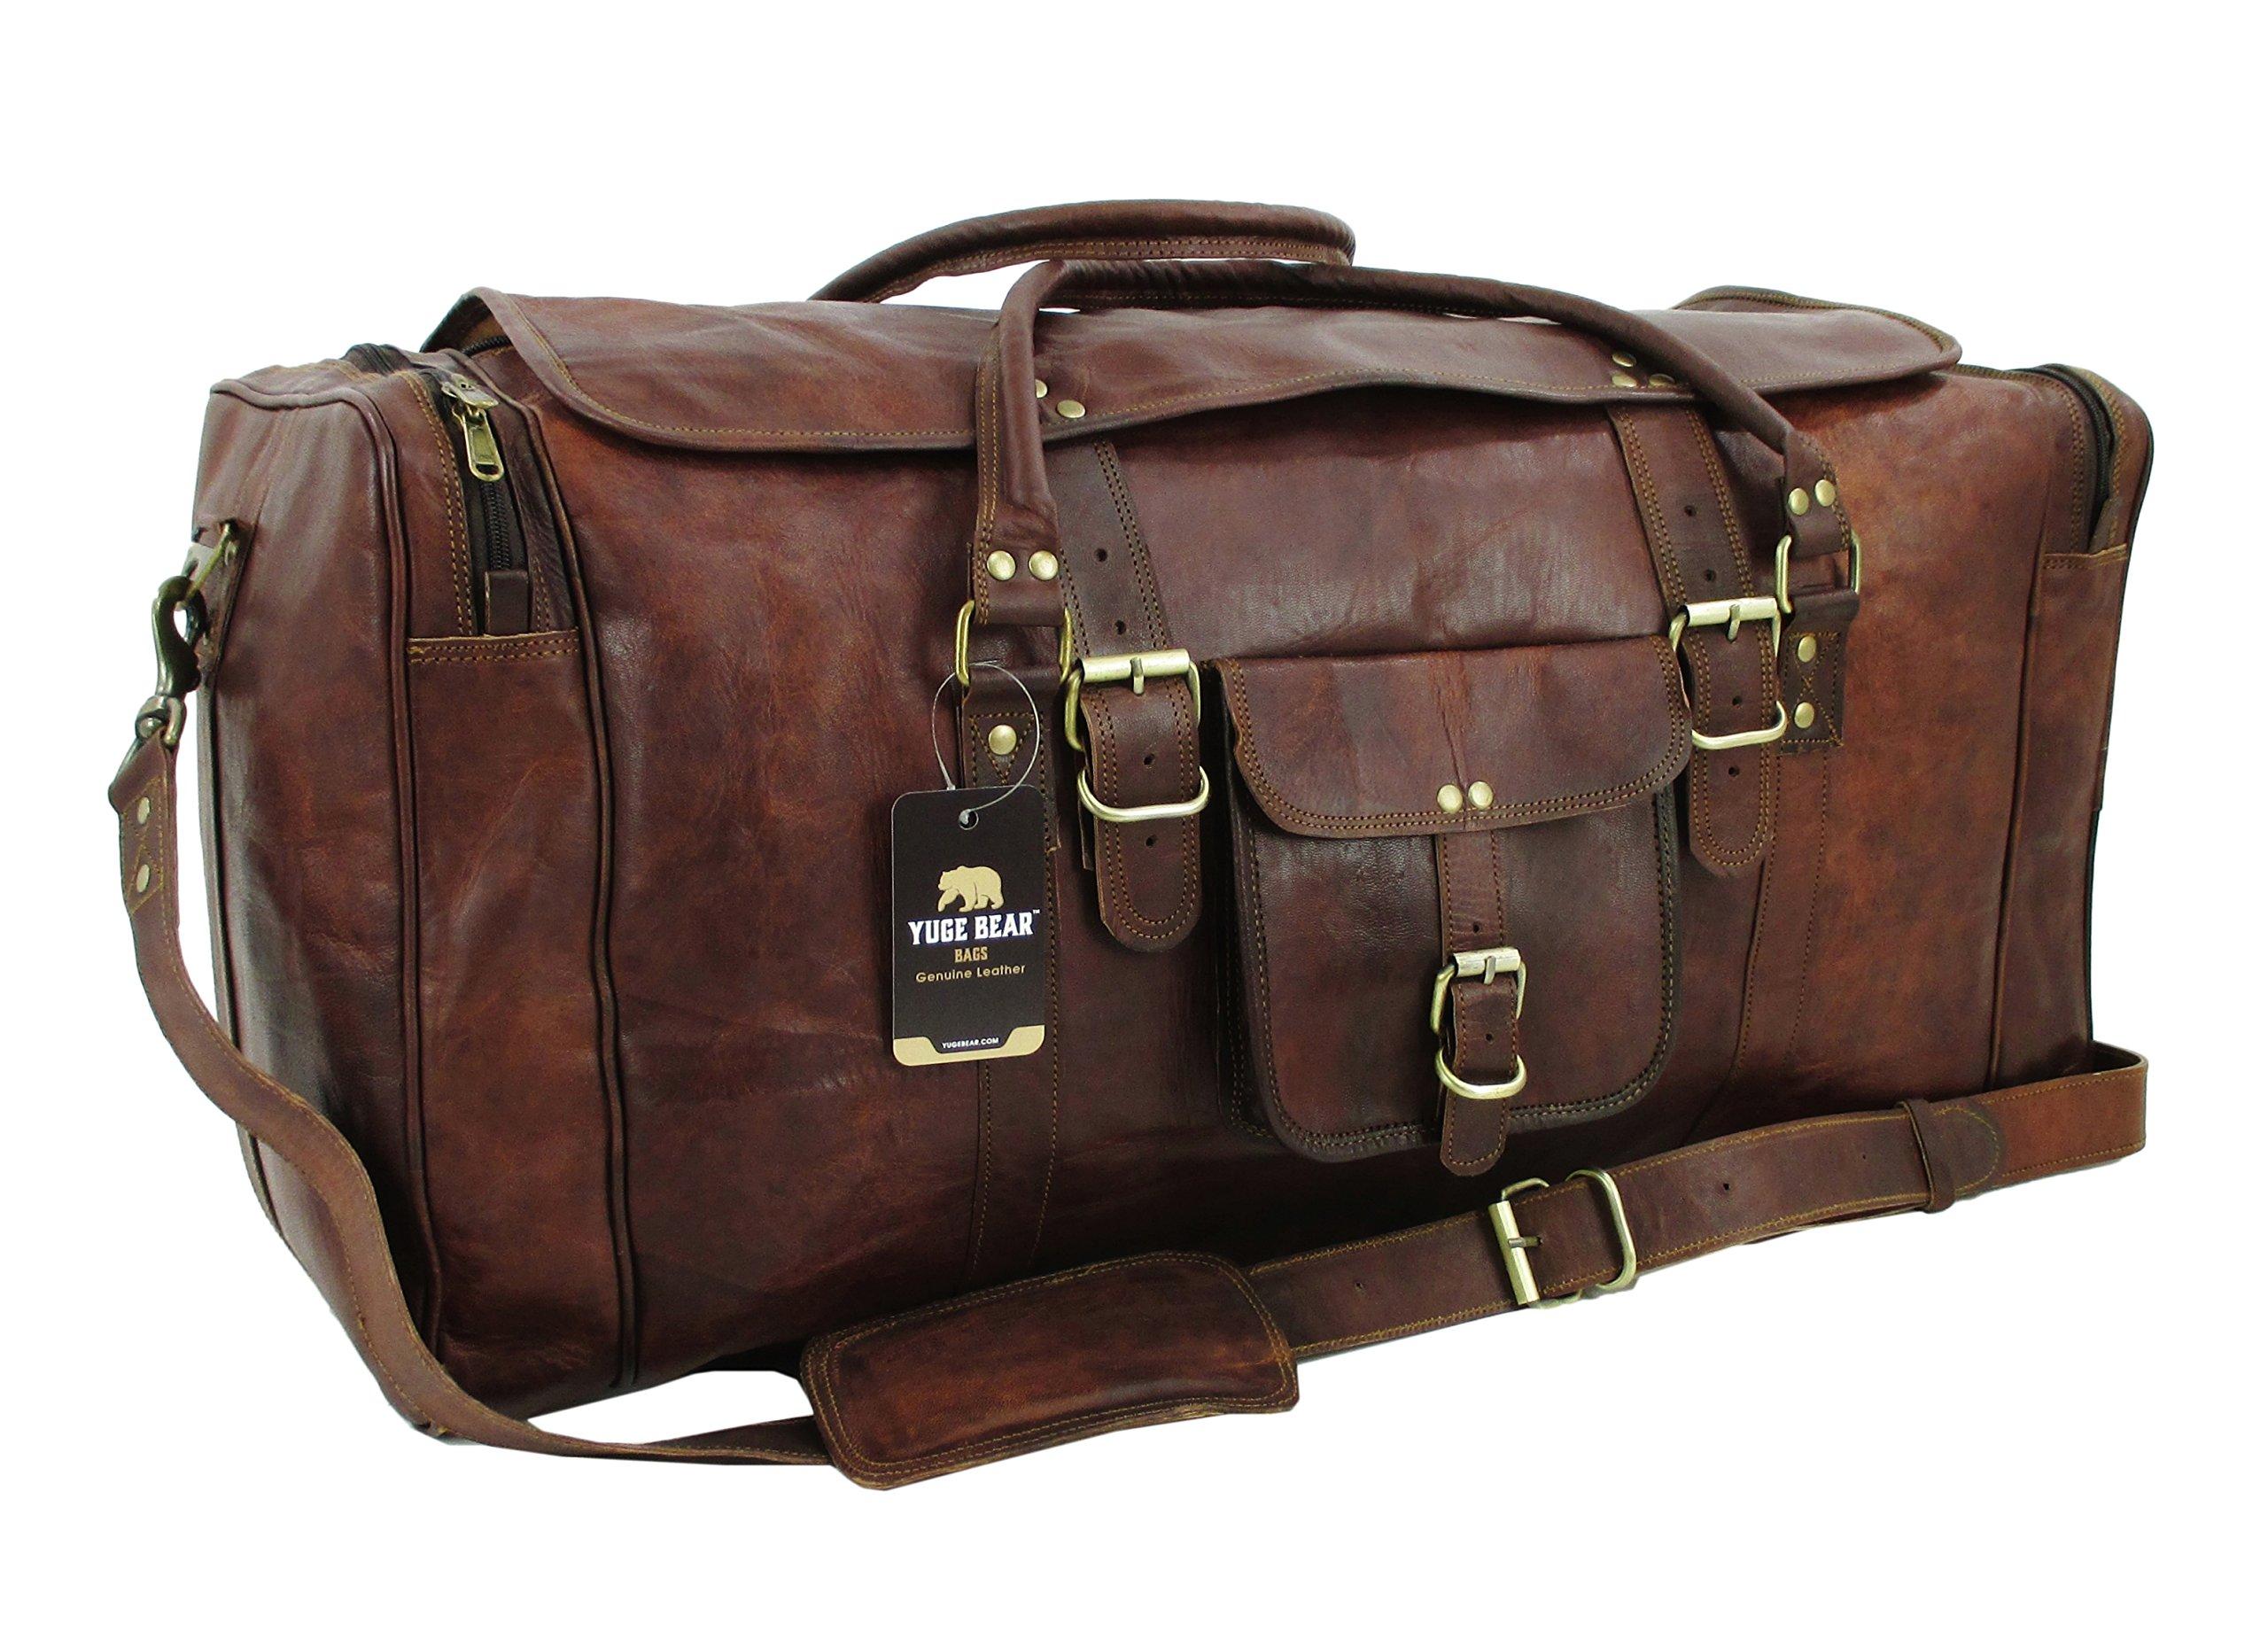 Yuge Bear 28'' FS3 Vintage Genuine Leather Extra Large Duffel Weekender Gym Bag